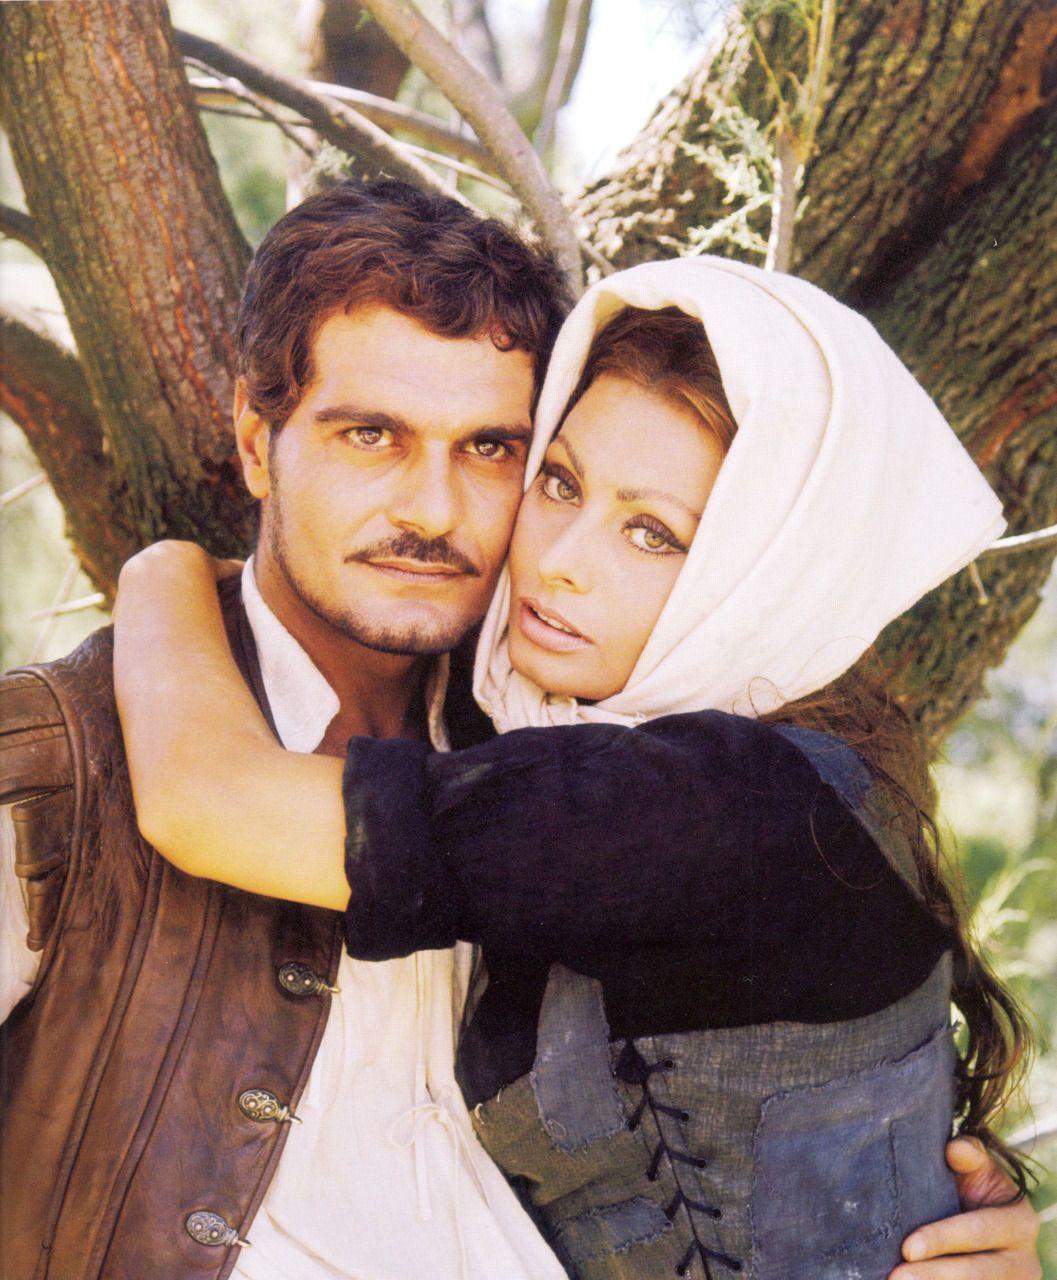 Omar Sharif Young | Omar Sharif and Sophia Loren in C'era una volta